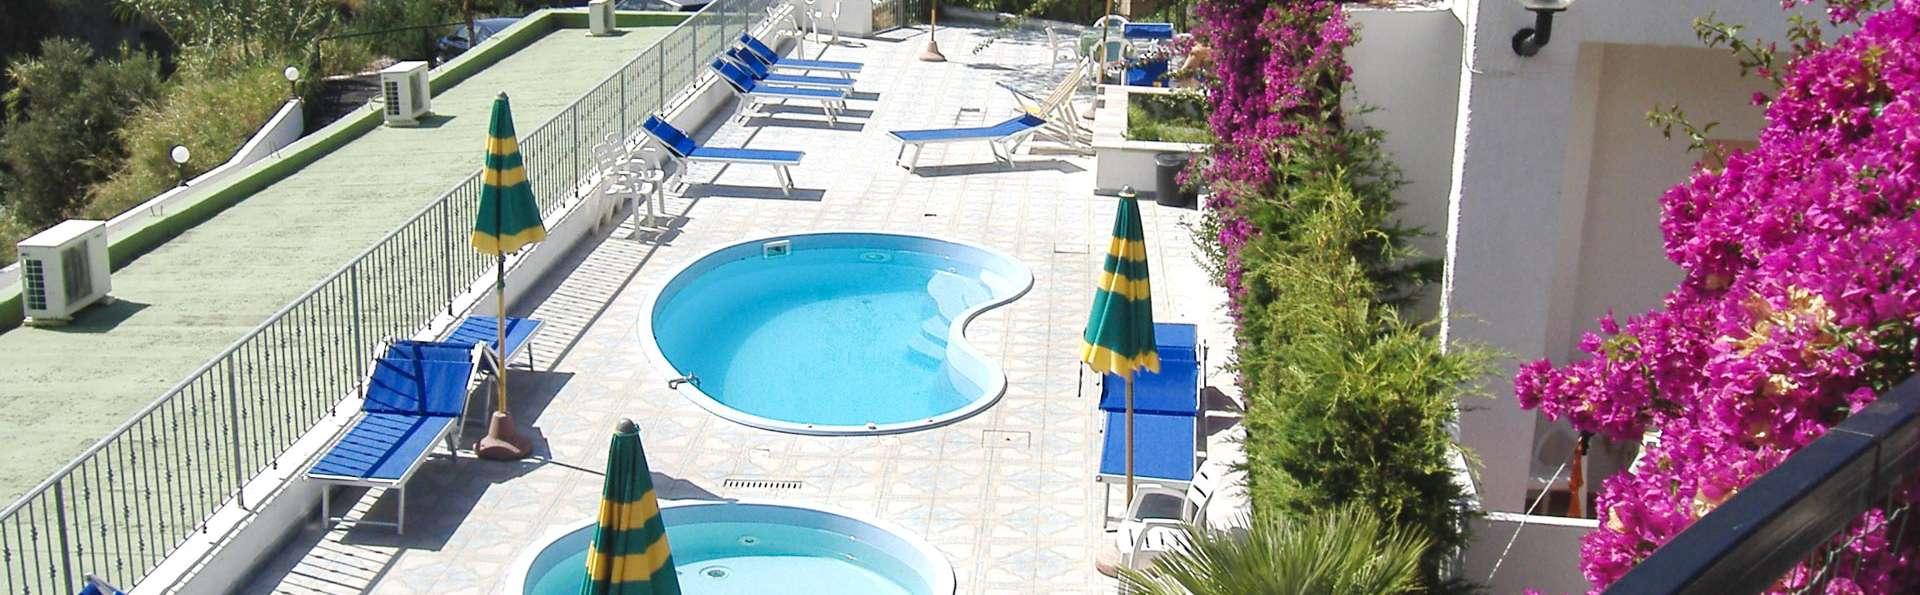 Hotel Castiglione Village - EDIT_POOL_01.jpg